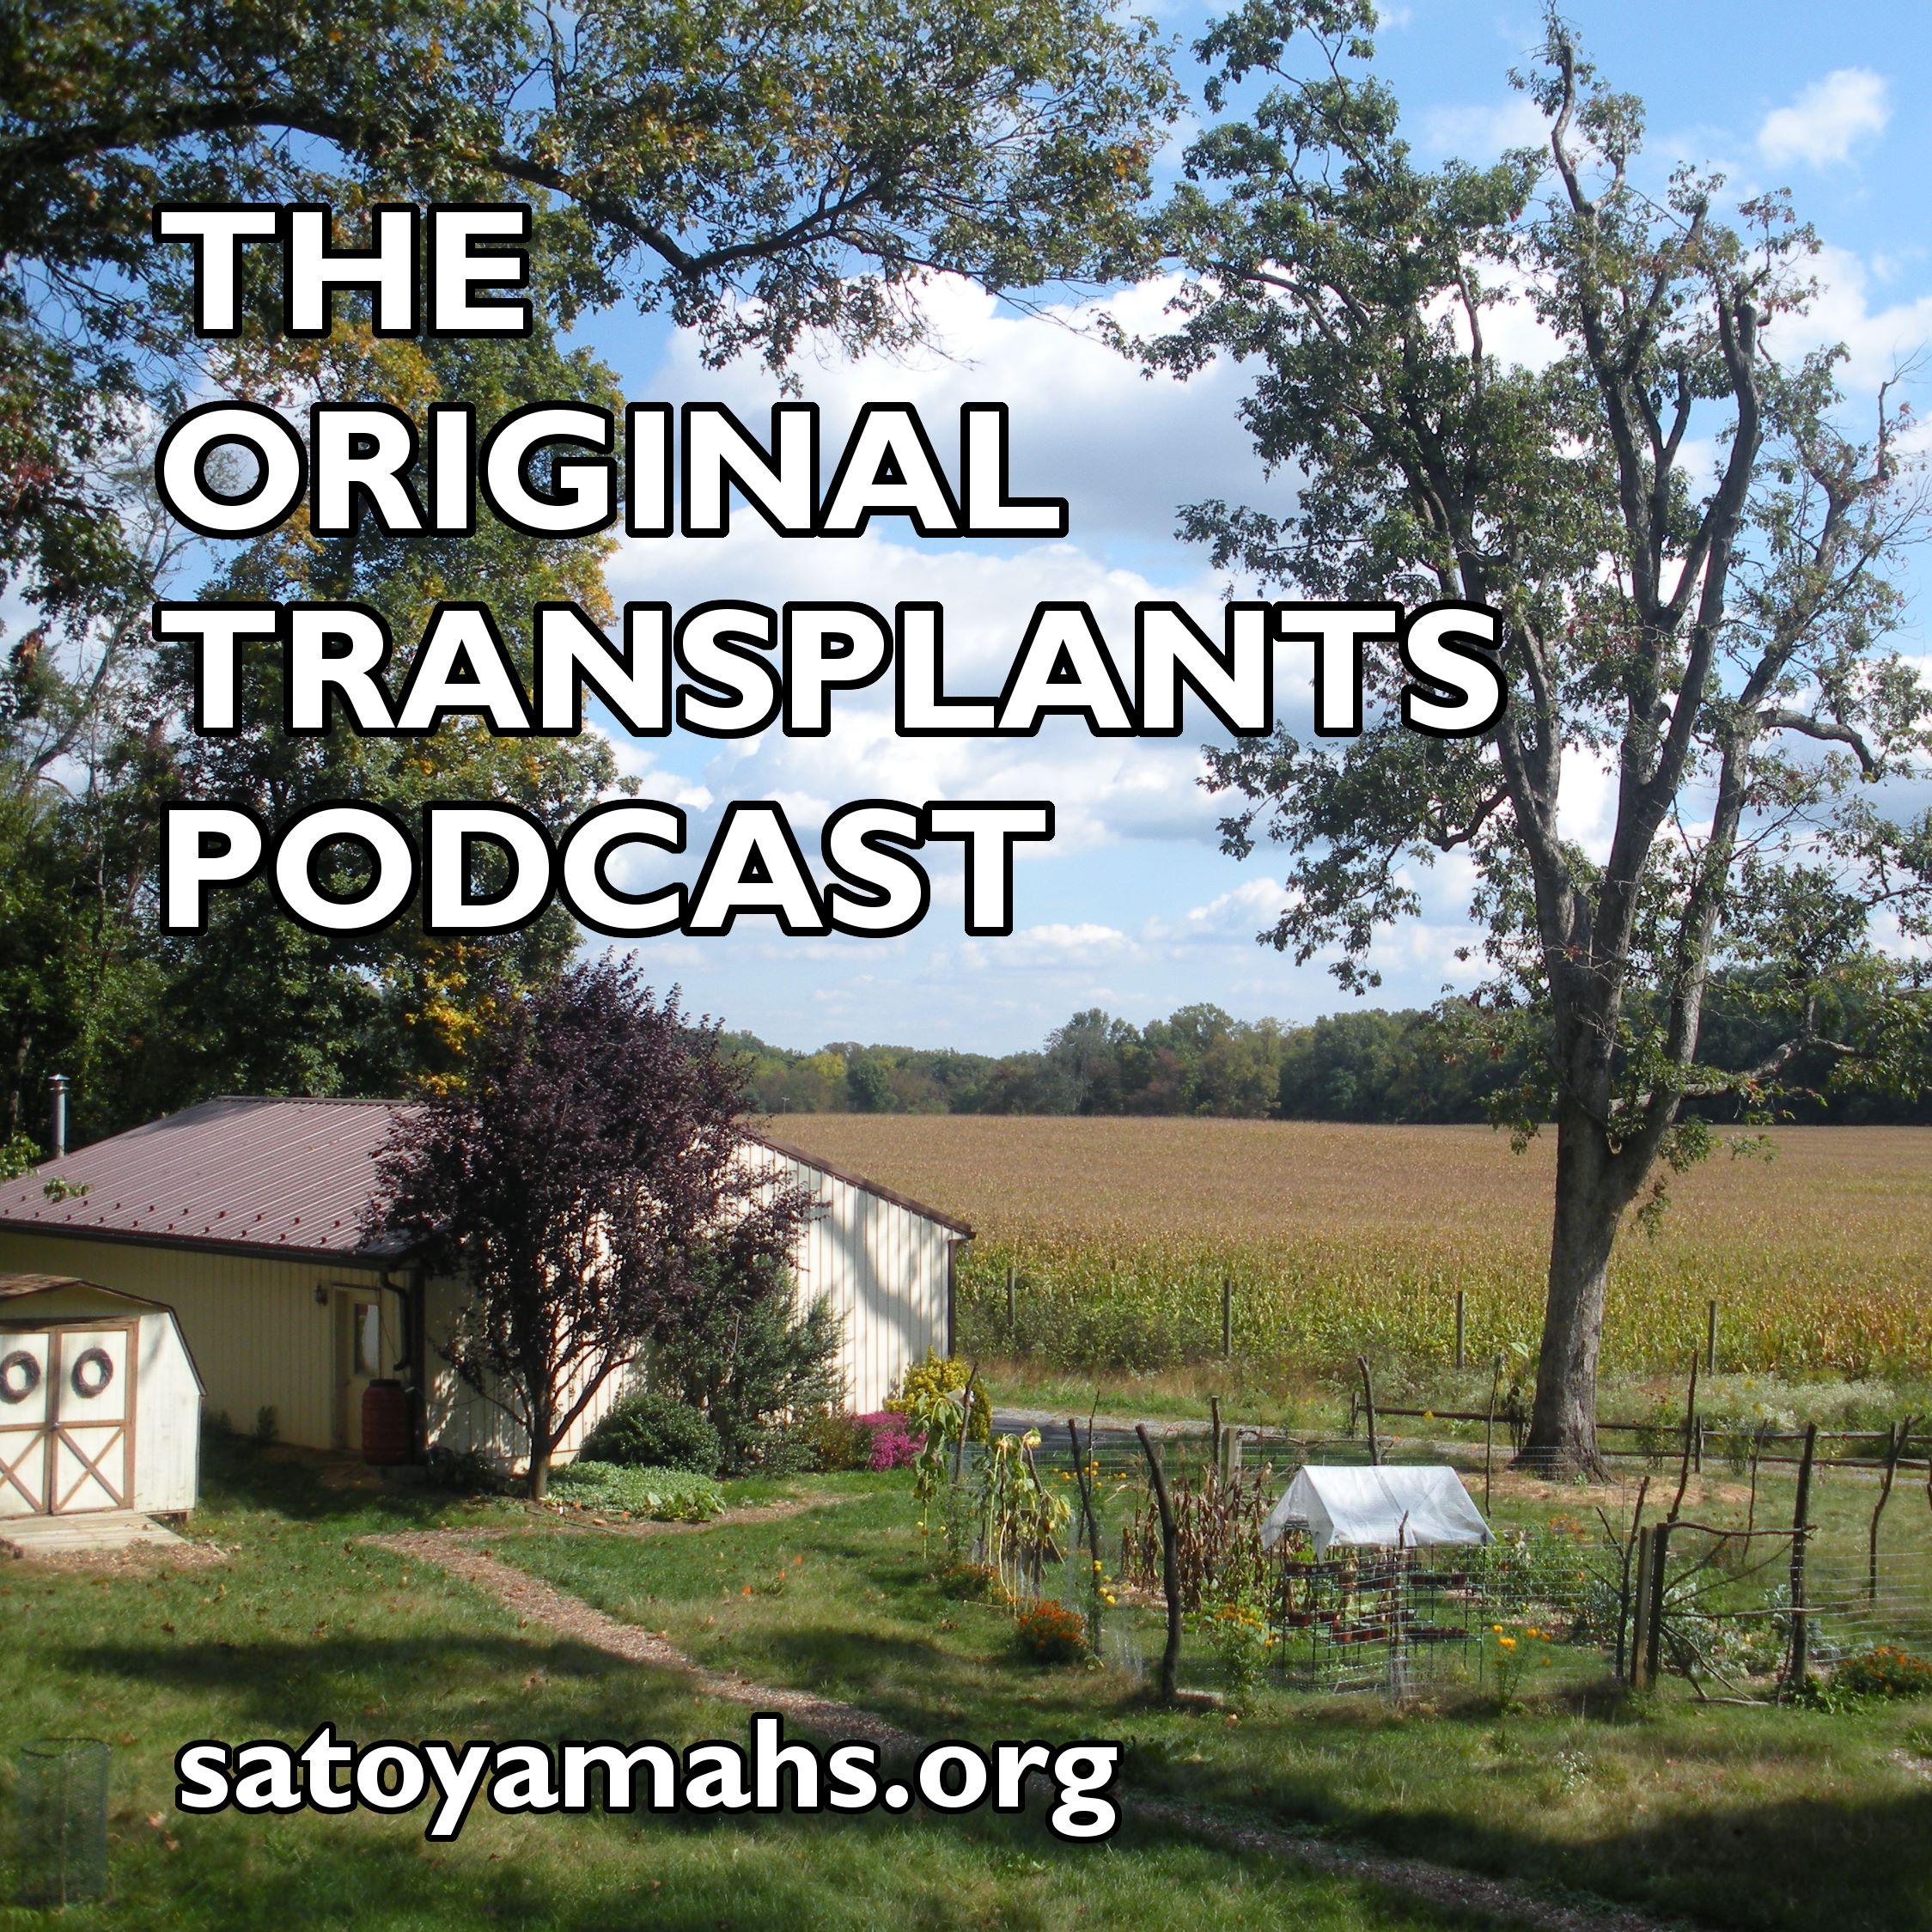 Original Transplants